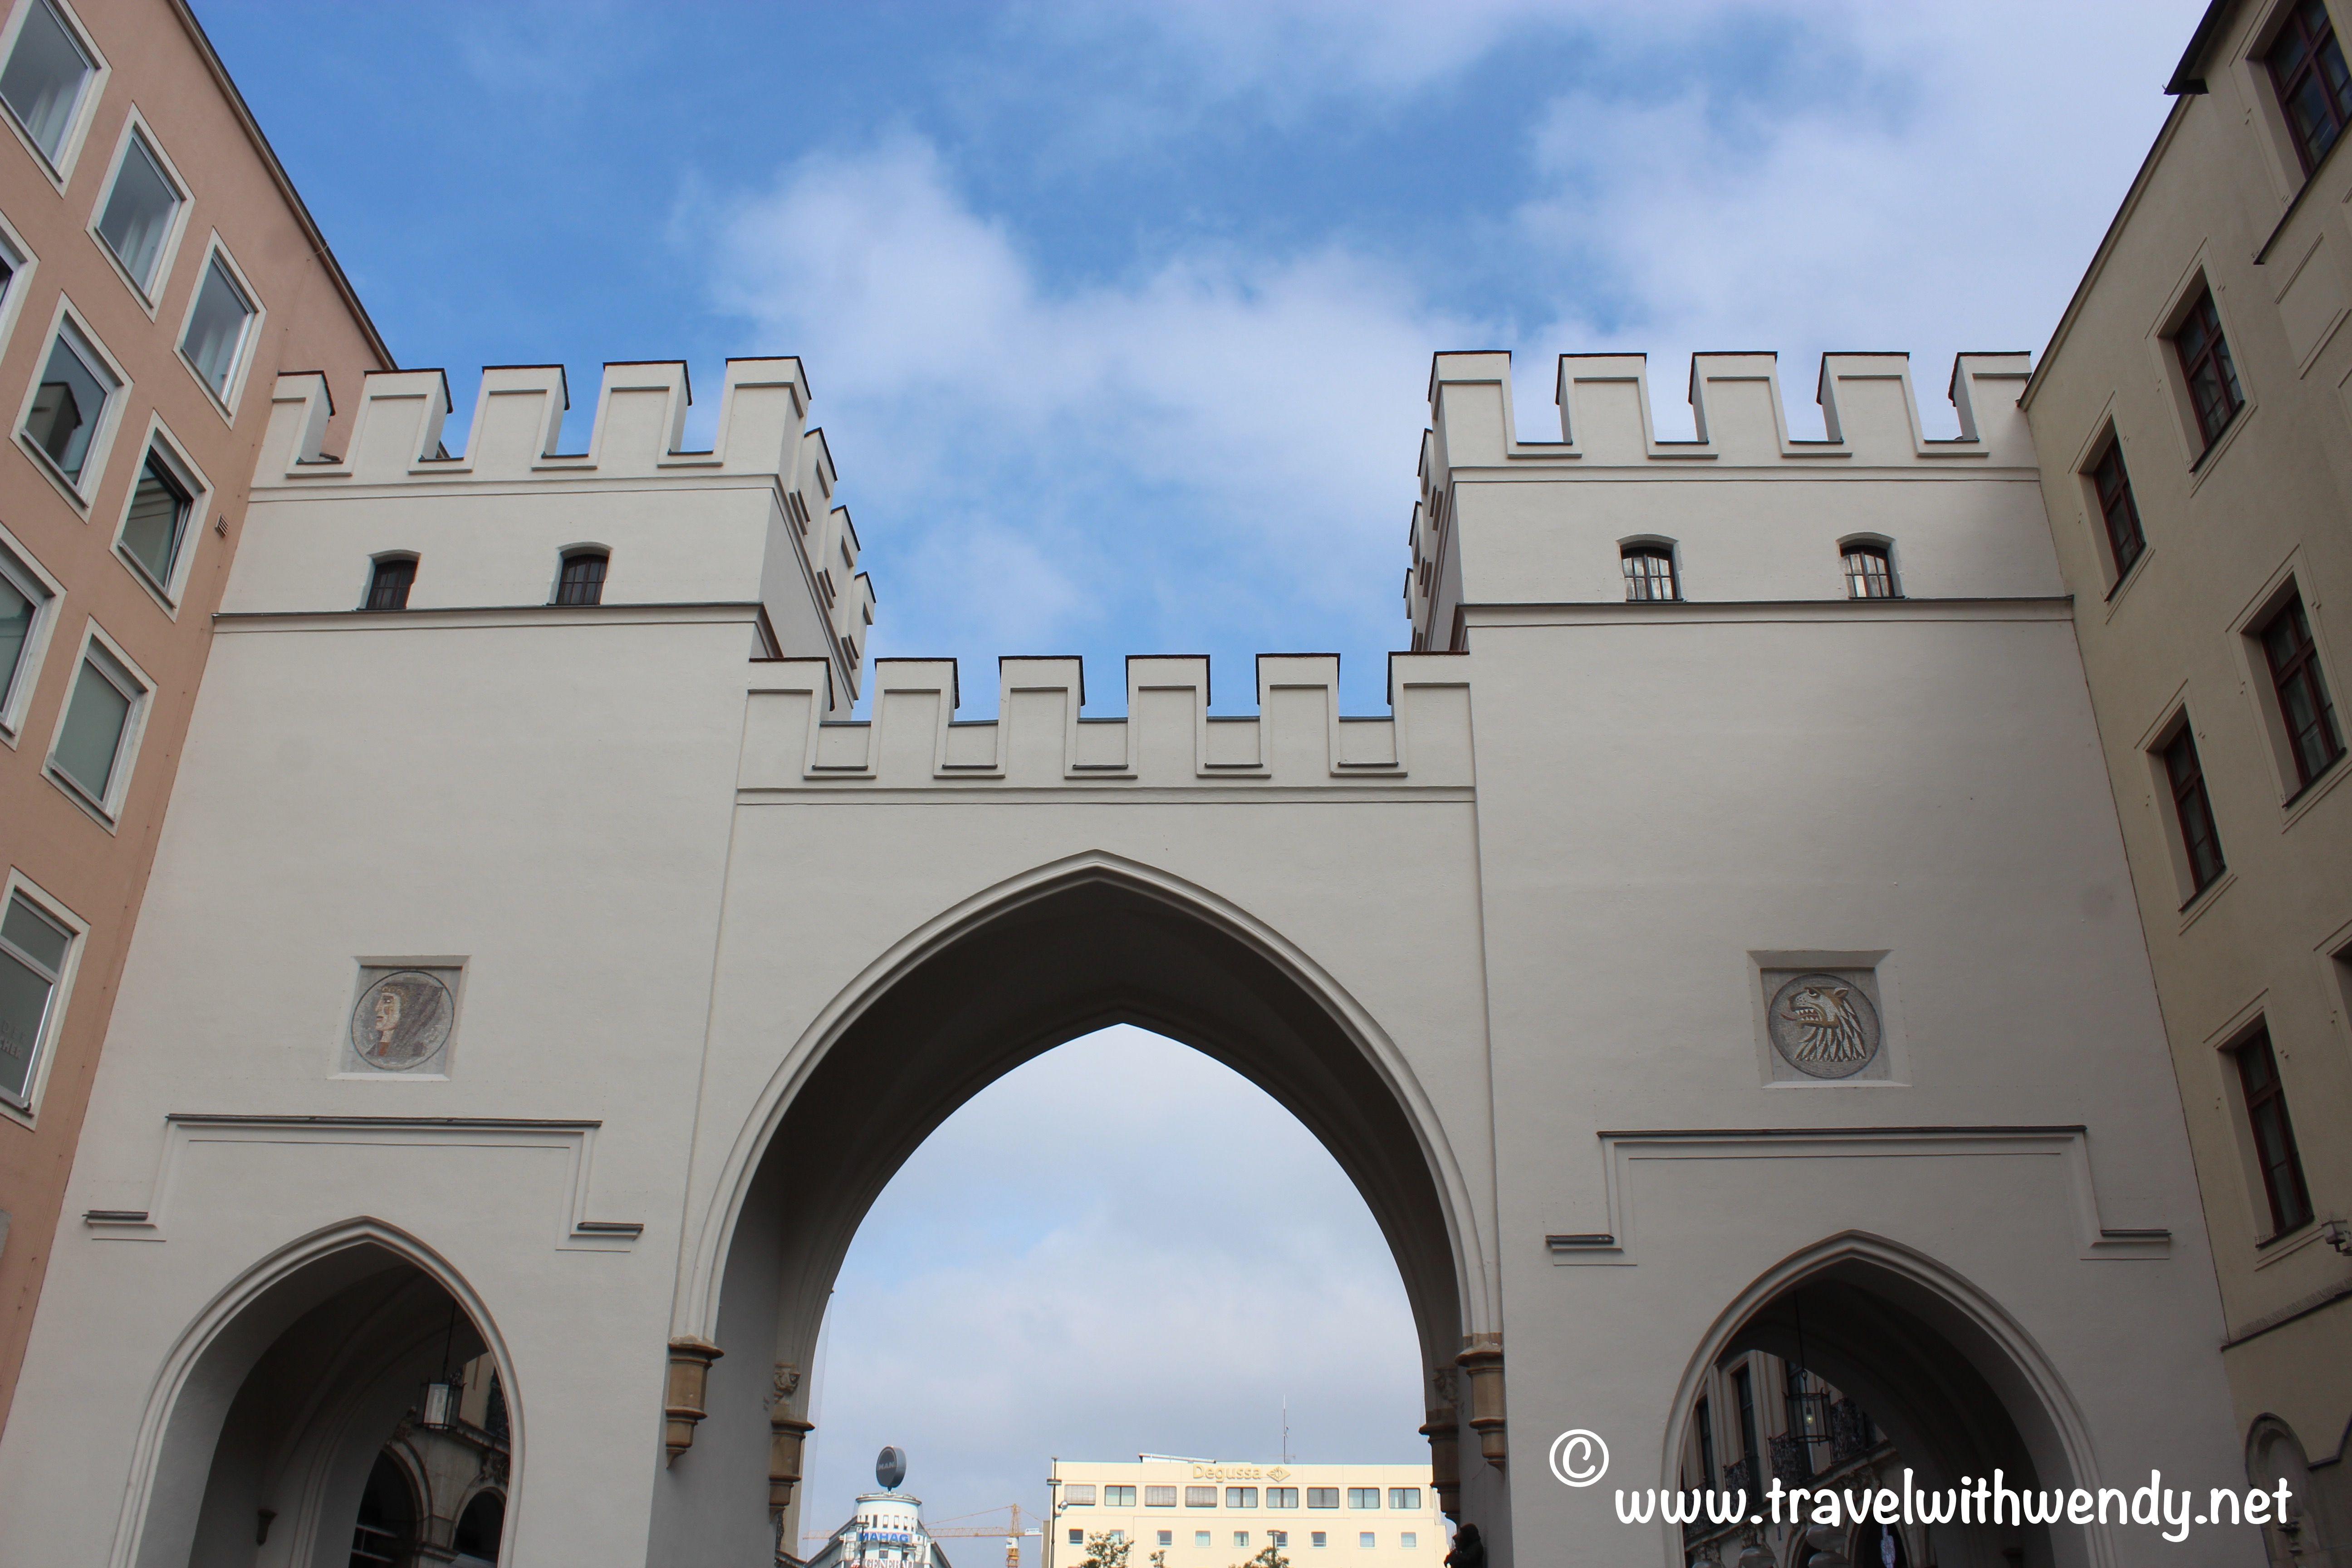 Charles Gate In Munchen 2016 Www Travelwithwendy Net Tvlwendy Travel Plan Your Trip Tour Guide